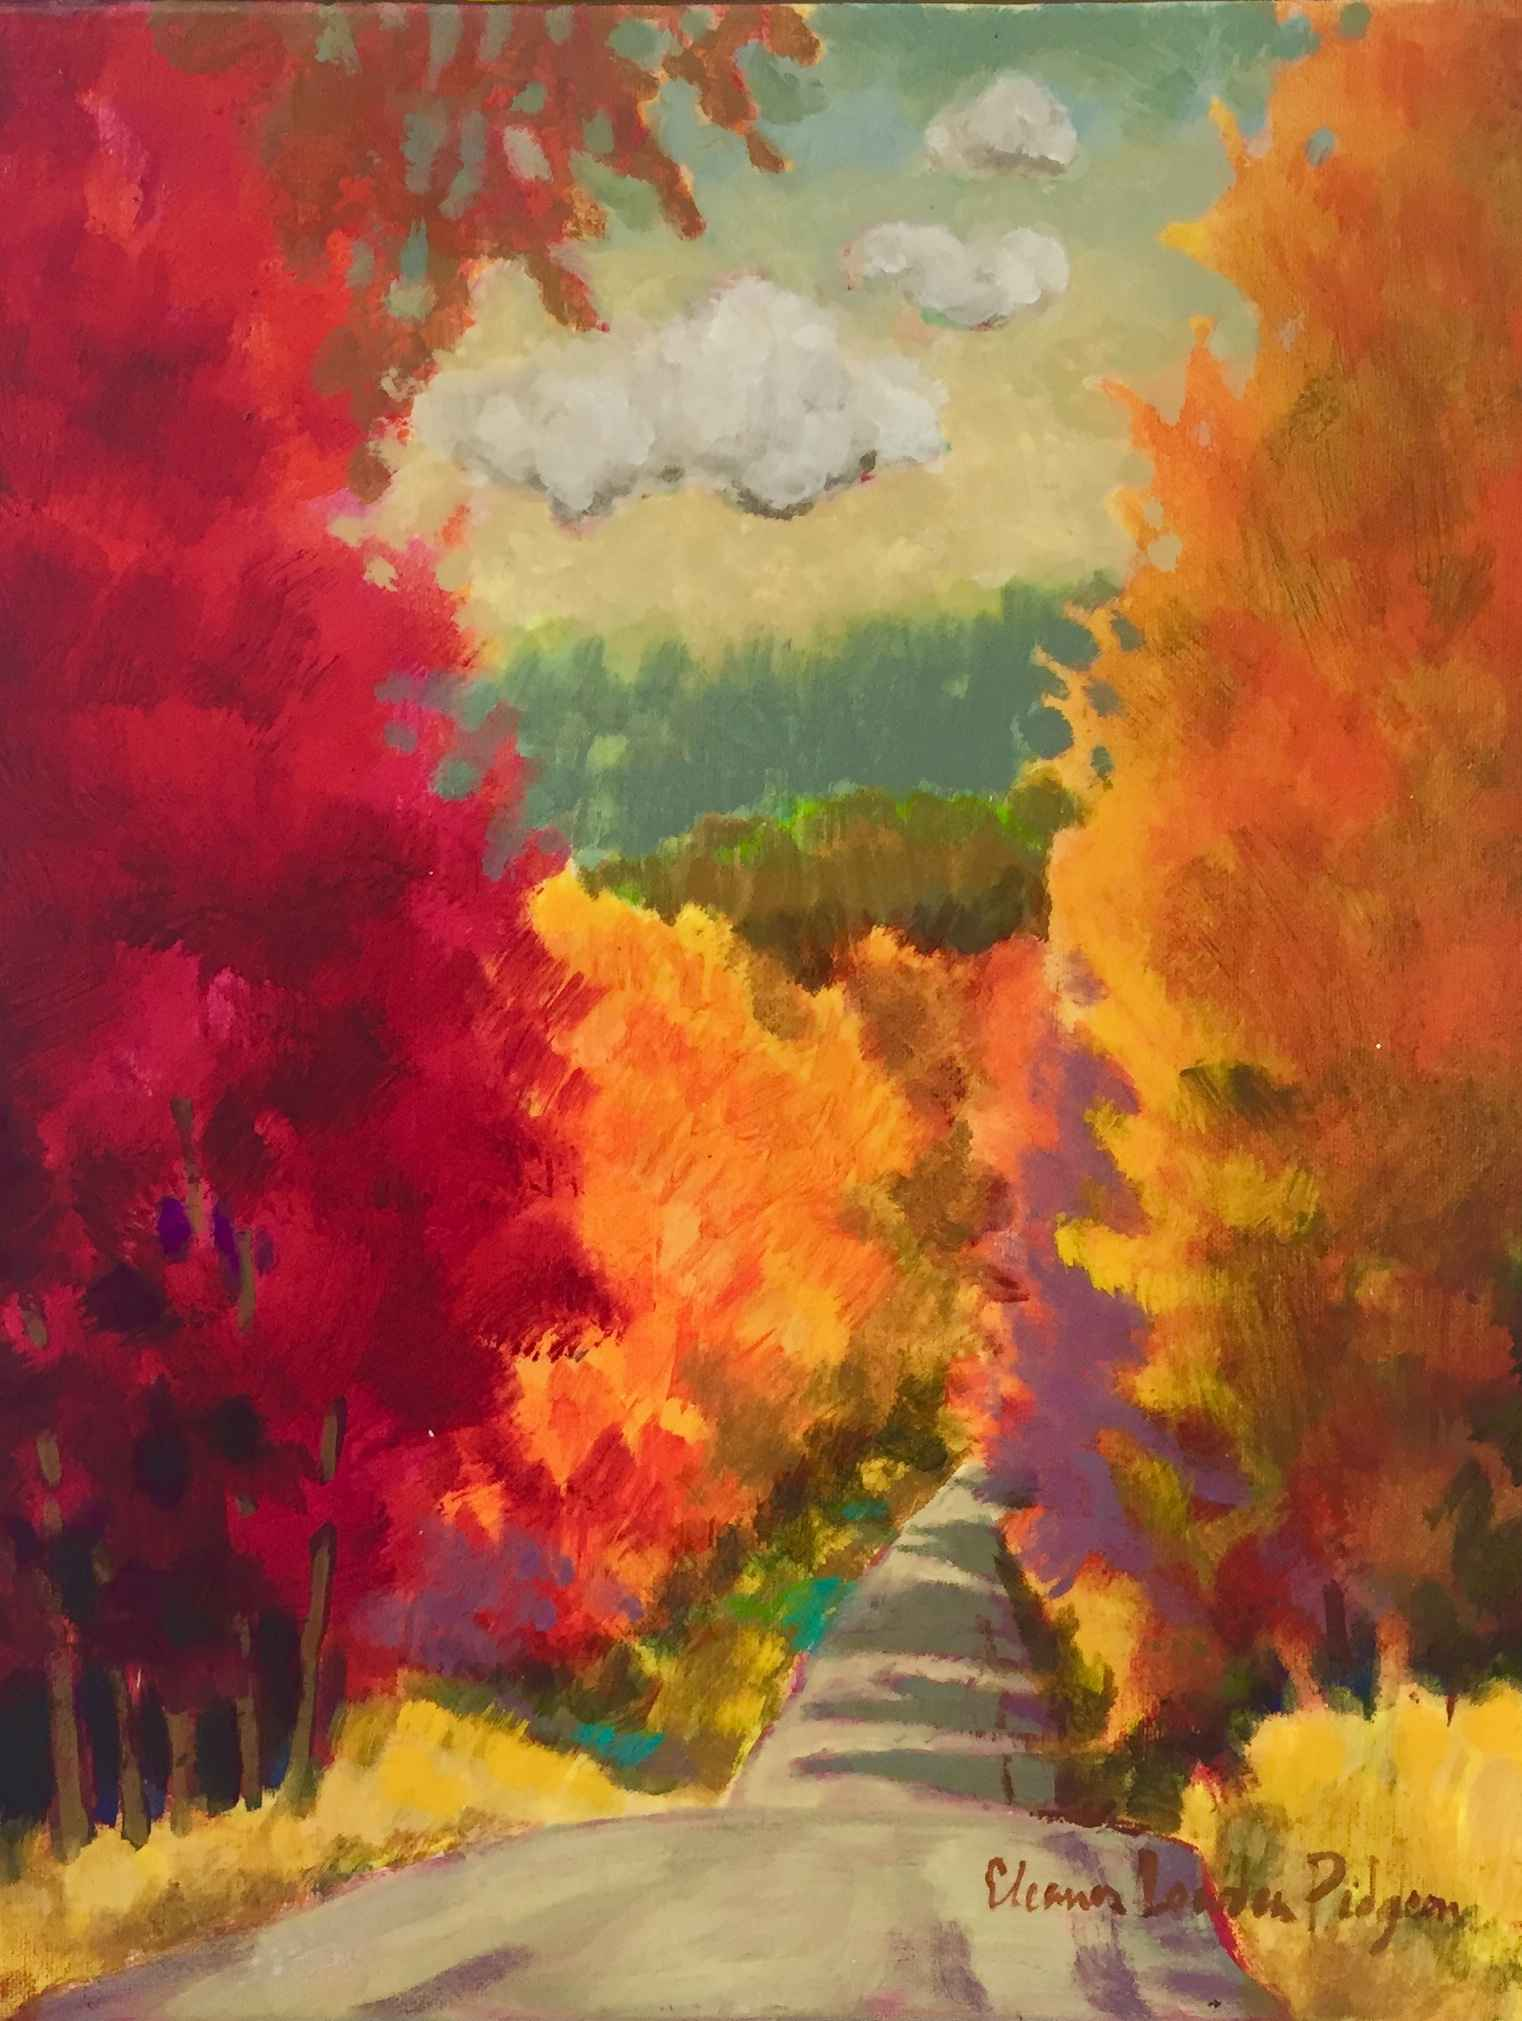 Finding Myself by  Eleanor Lowden - Masterpiece Online